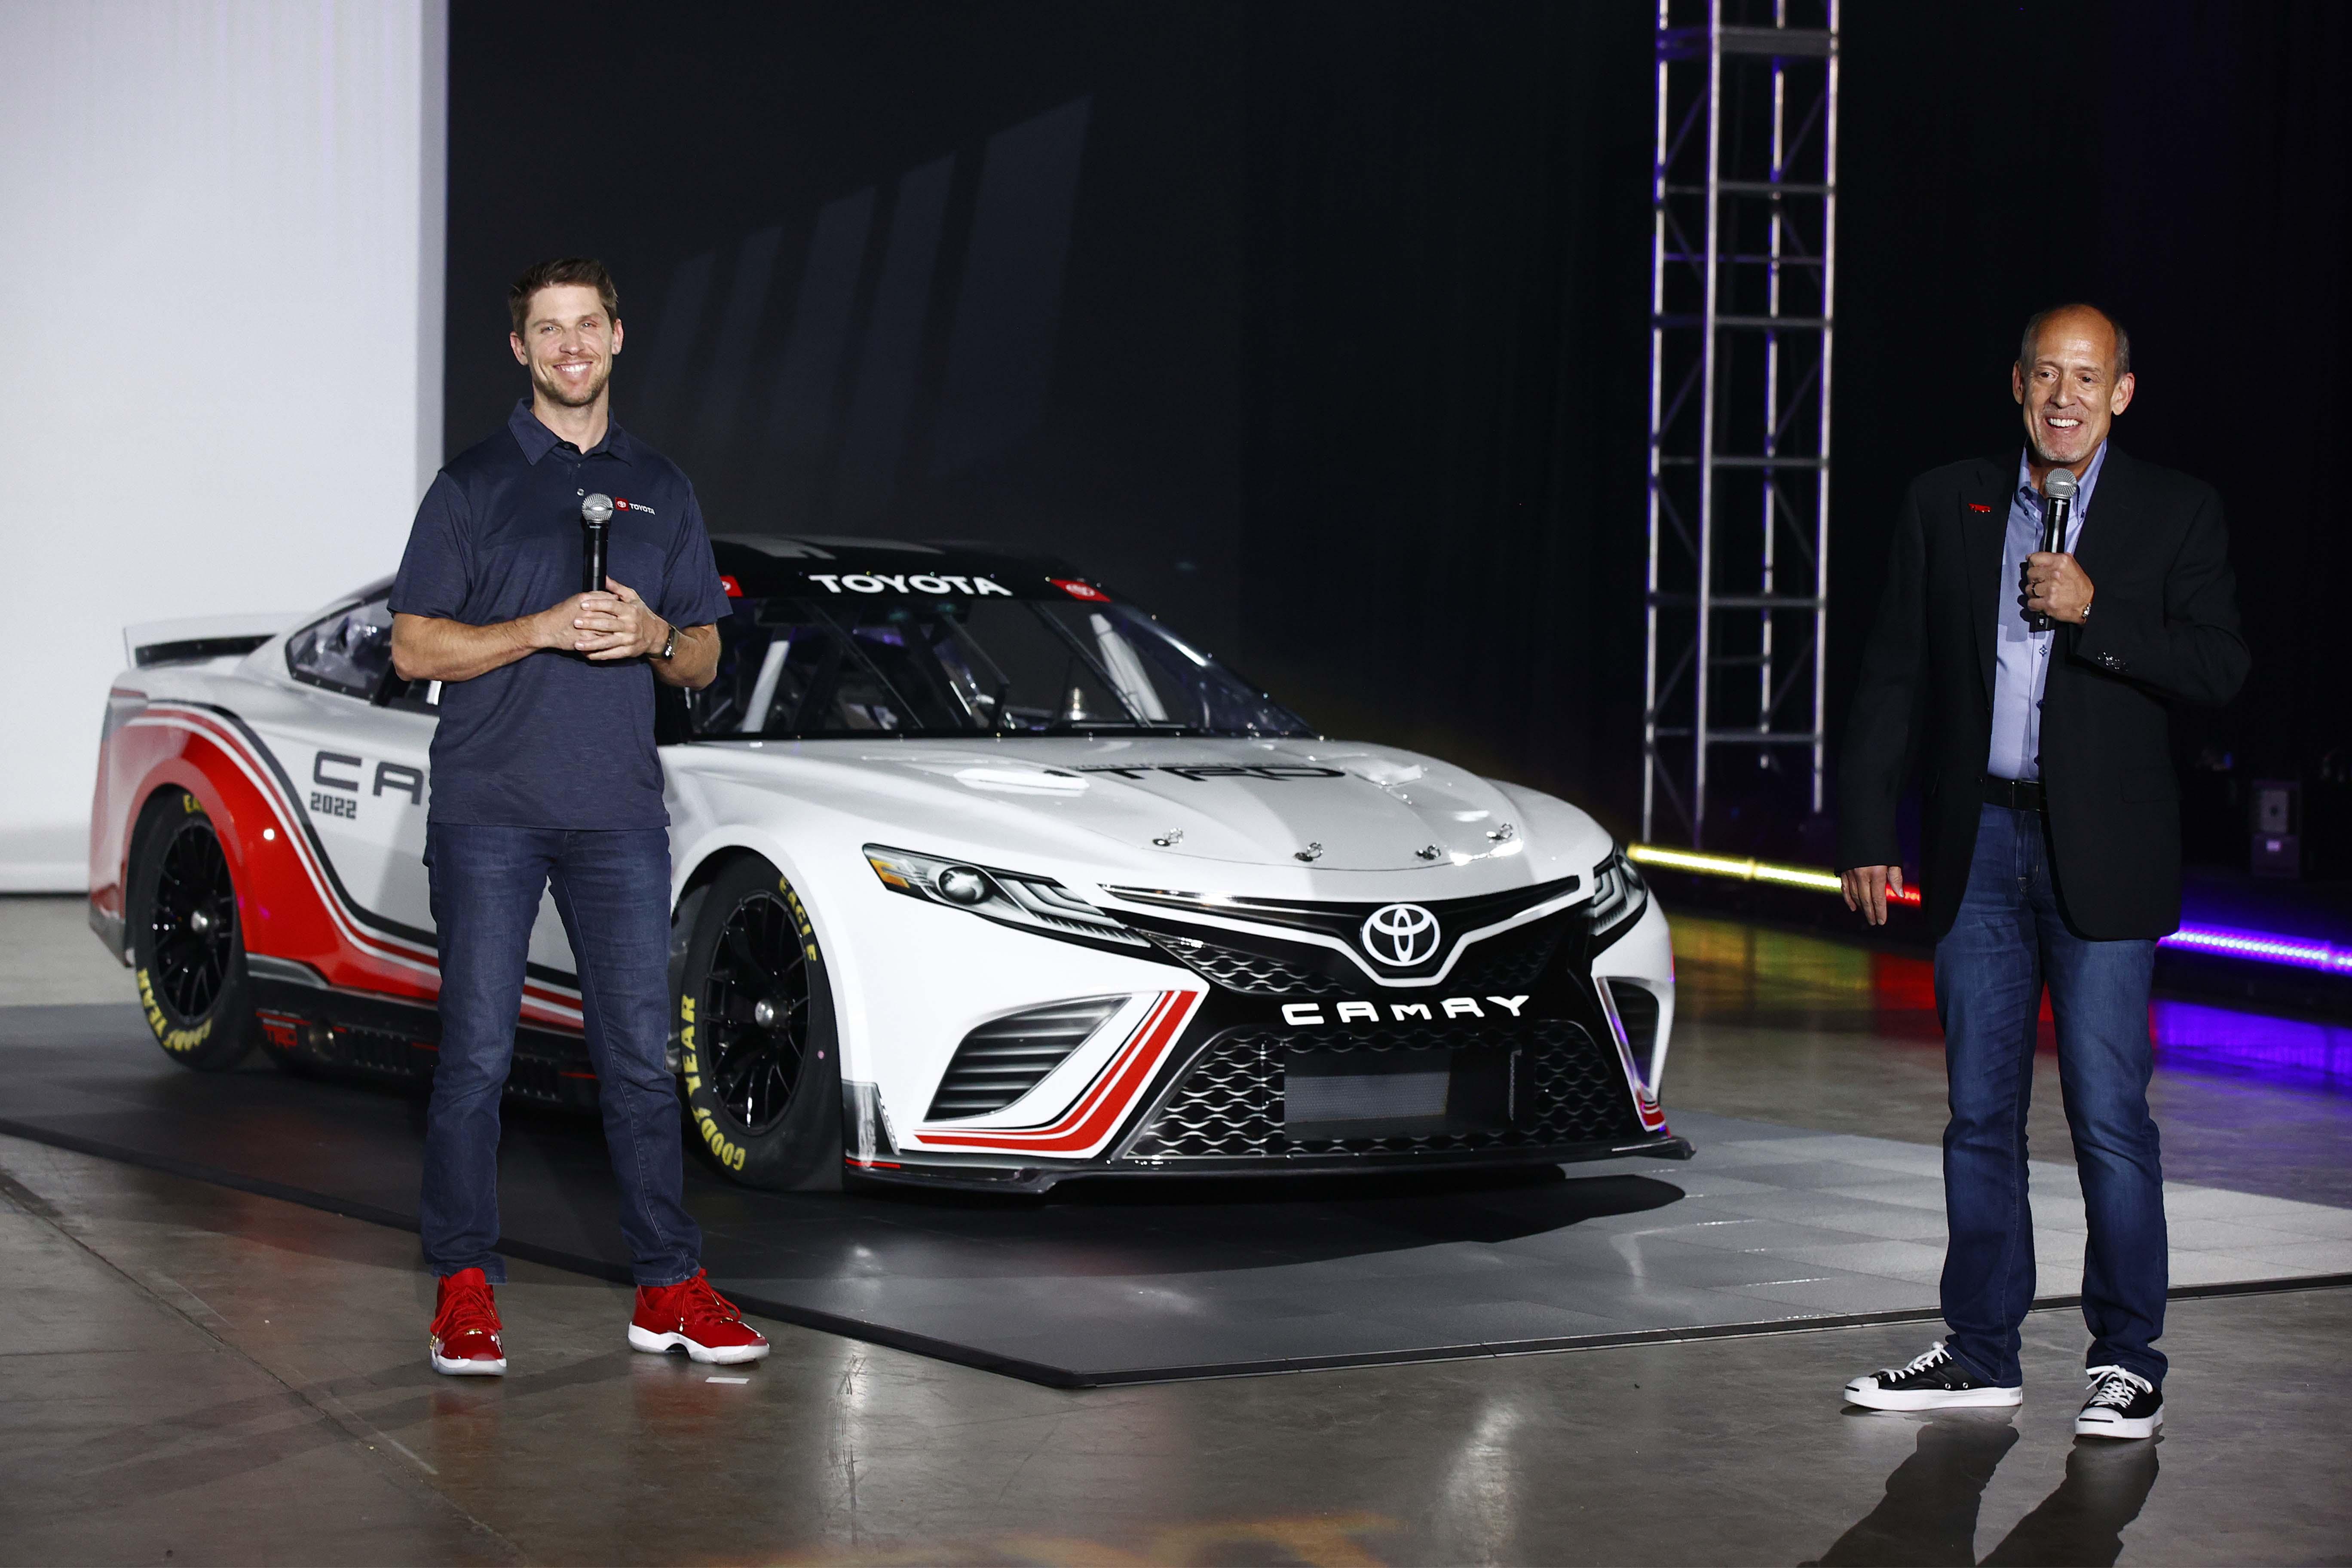 Denny Hamlin and Toyota David Wilson - NASCAR Next Gen